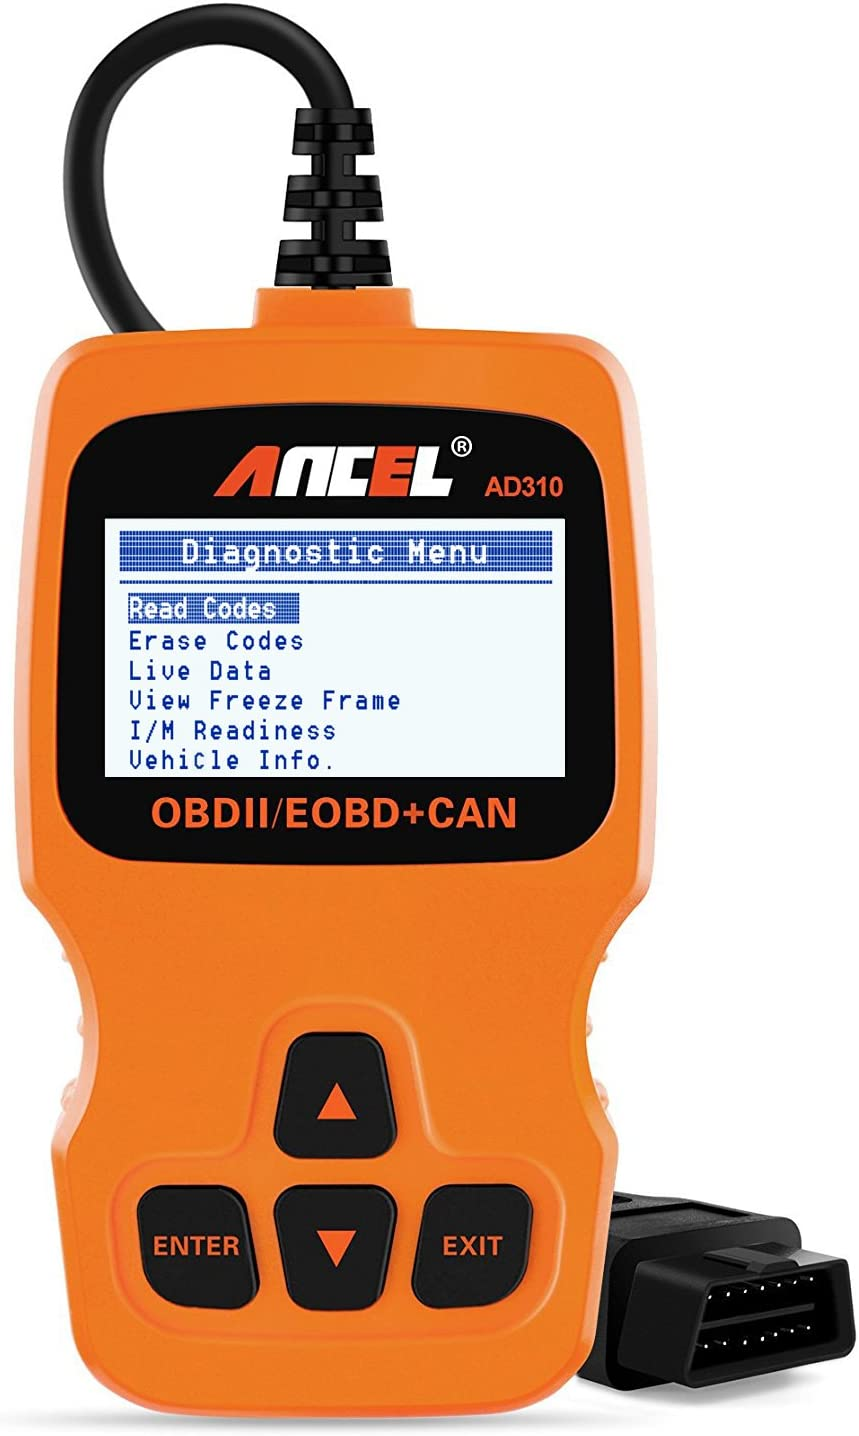 Orange ANCEL AD310 Classic Enhanced Universal OBD II Scanner Car Engine Fault Code Reader CAN Diagnostic Scan Tool